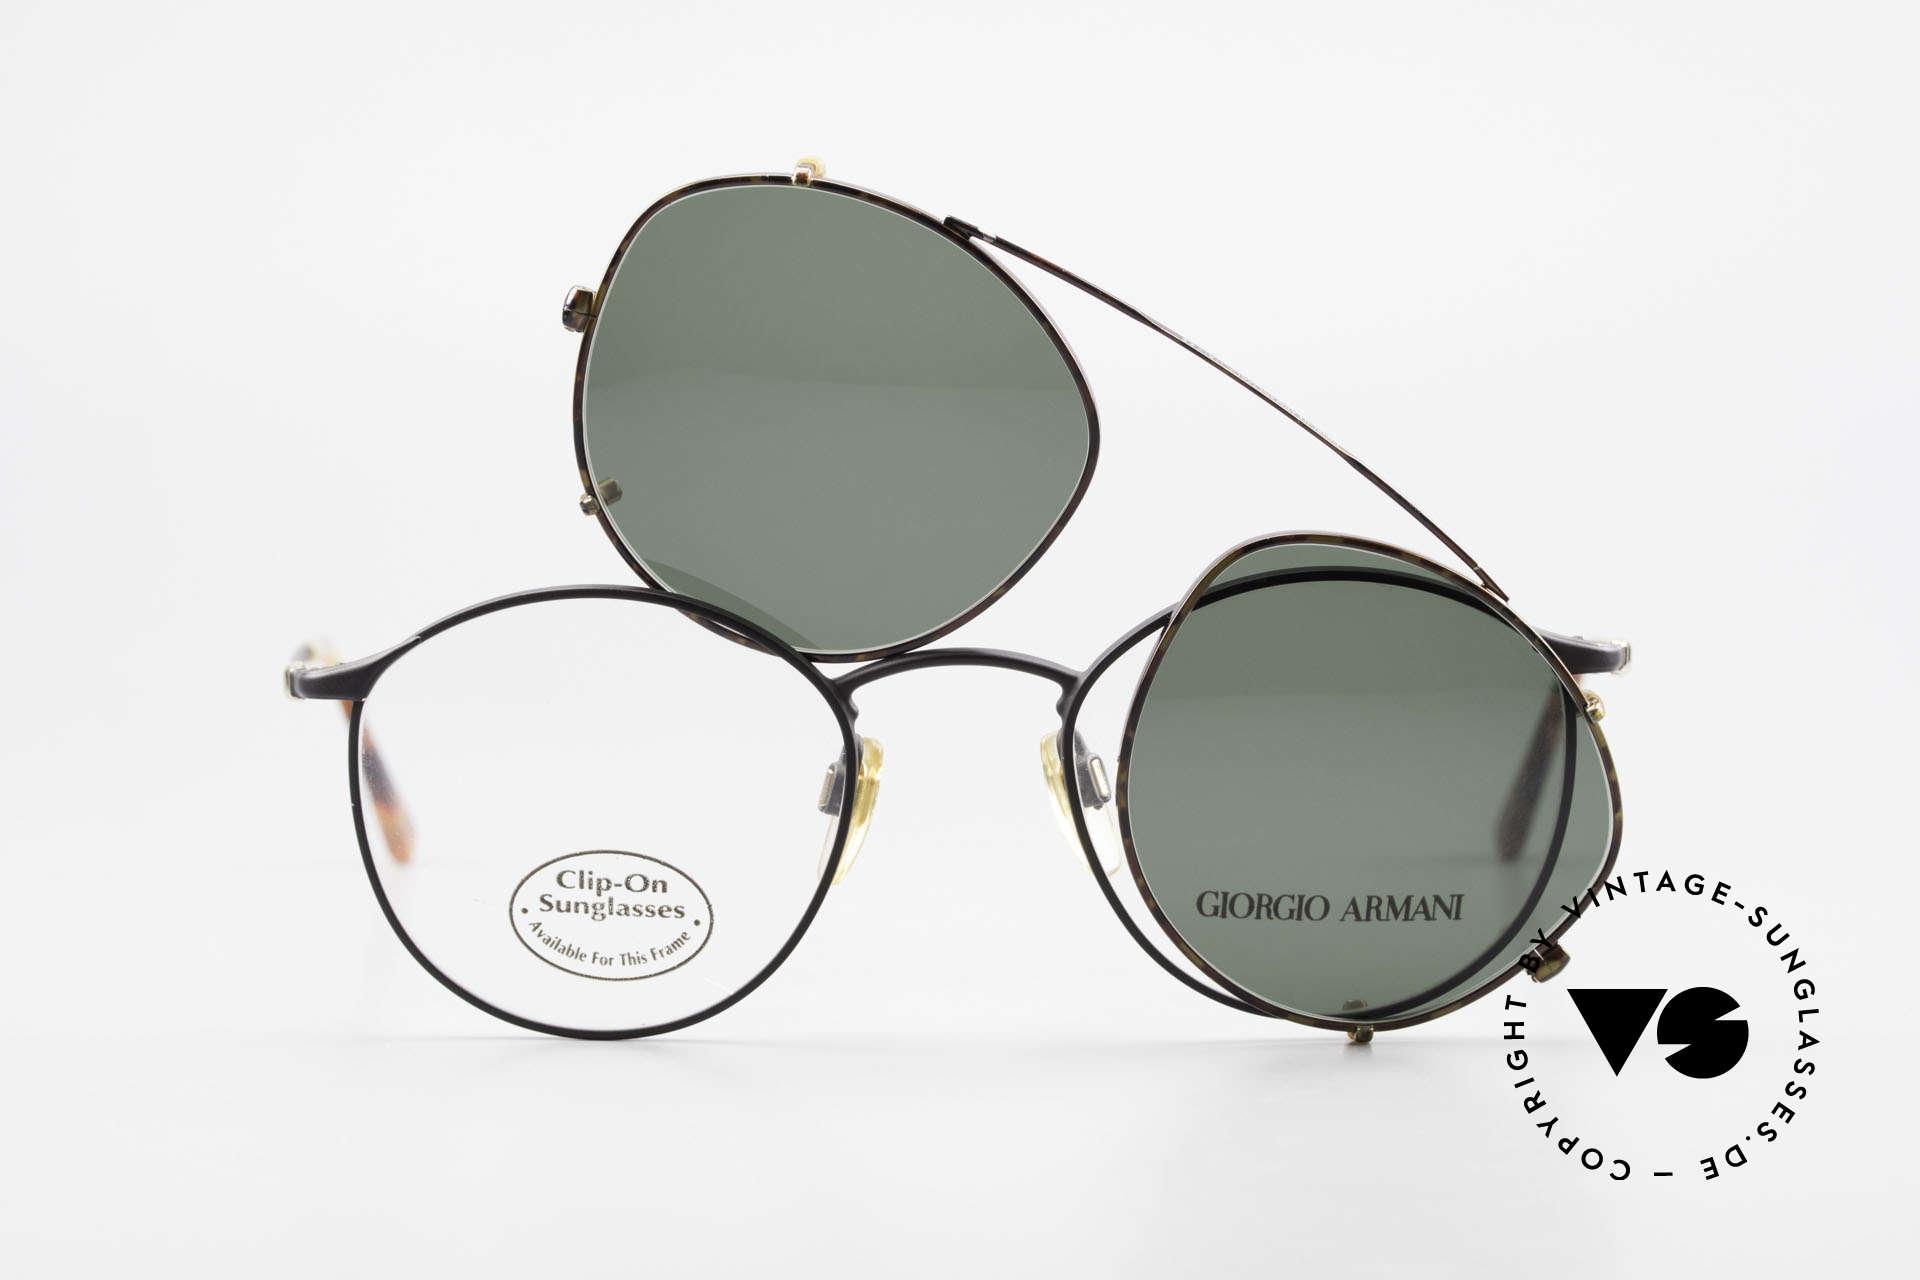 Giorgio Armani 132 Clip On Panto Eyeglasses 90's, Size: medium, Made for Men